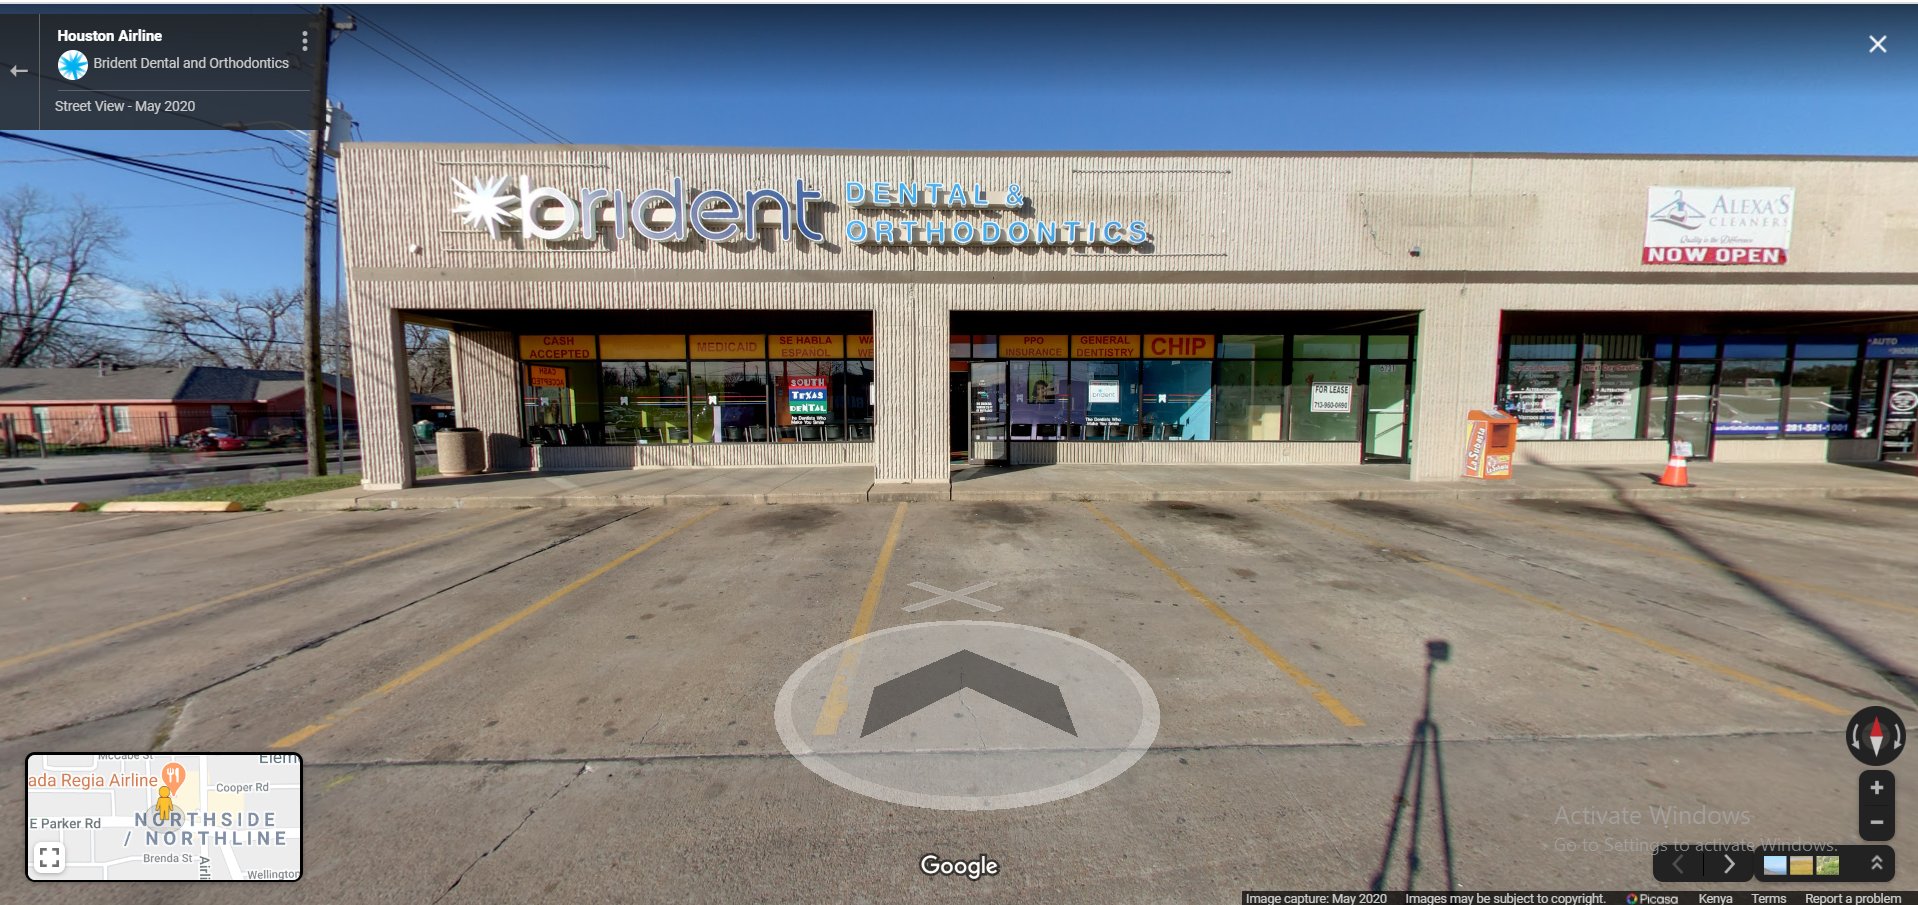 Premier Dental Services (Houston Airline - South Texas Dental)